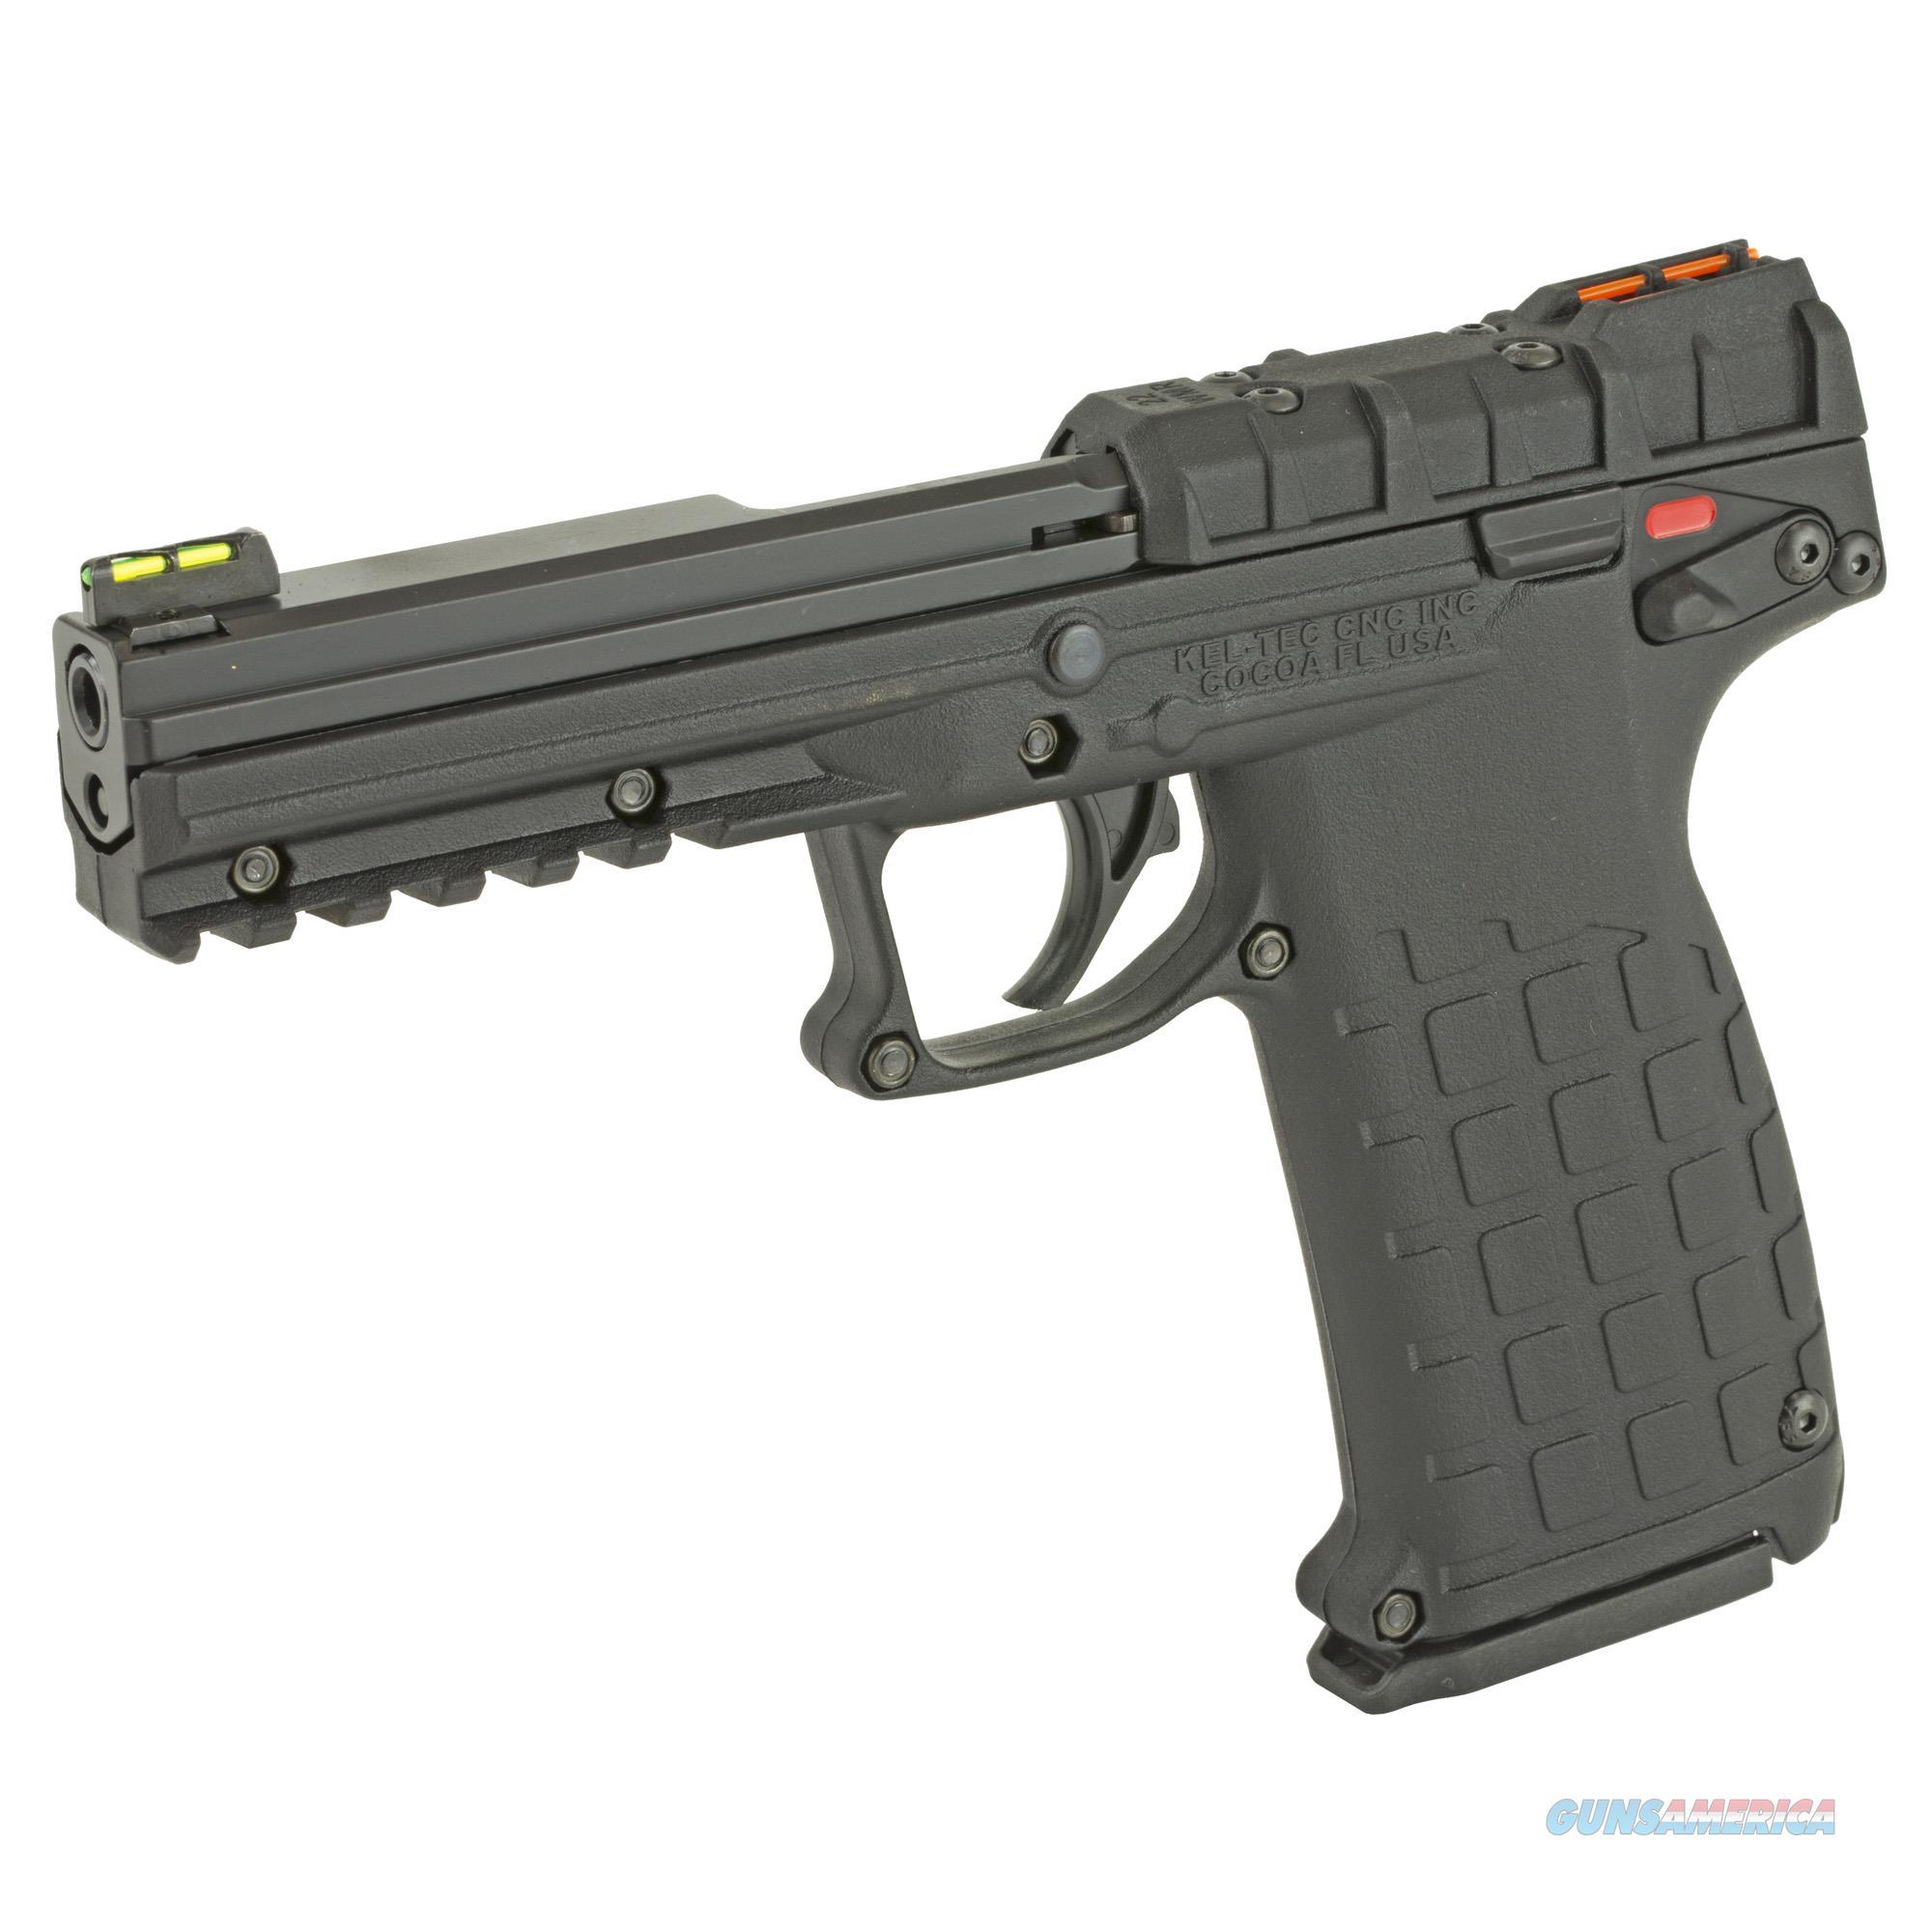 Kel-Tec PMR-30 22WMR w/2 Mags!  Guns > Pistols > Kel-Tec Pistols > Other